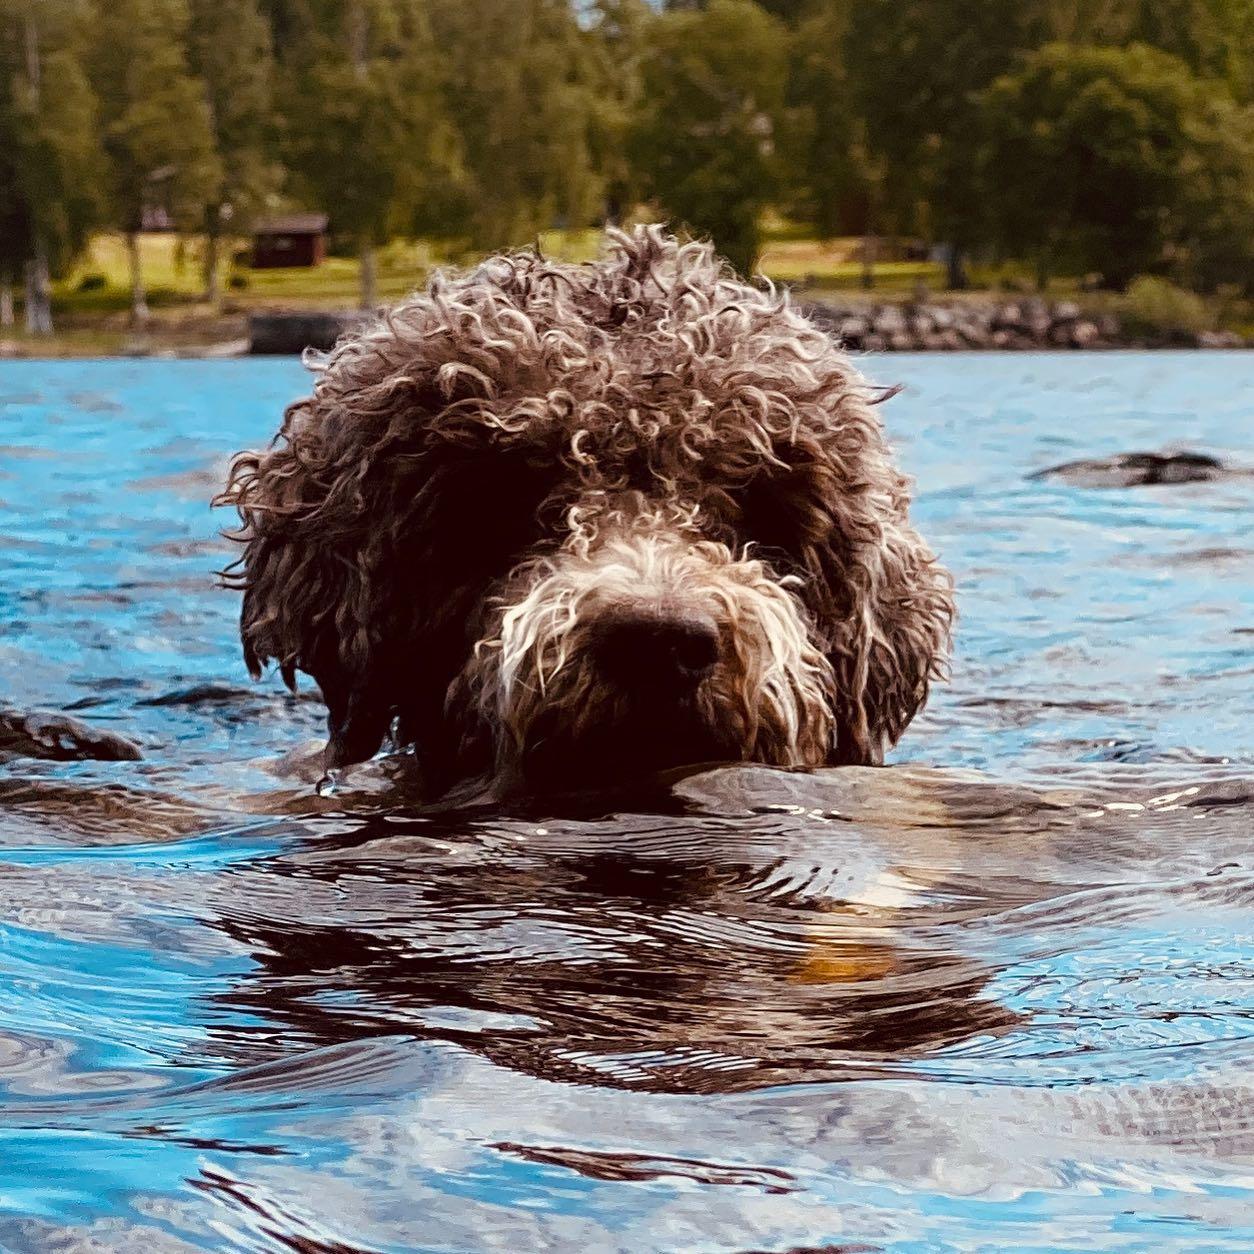 I know how to swim! #lagottosofinstagram #lagottopuppy #italianwaterdog #truffledog #lagottoromagnolo_daily #happydoglife #Lagotto #Dogs #DogsOfInstagram #Petstagram #Pets #Dogstagram #MyLife #MyDailyLife #PappaJagVillHaEnItalienare #MacLagotto #Falun #Sweden #FF #l4l #instafollow @knappare @liminglindblad @k.rowntree @taxen_coco @h3lvetesjavlar This was posted by my Dad: @kristerlindholmfalun